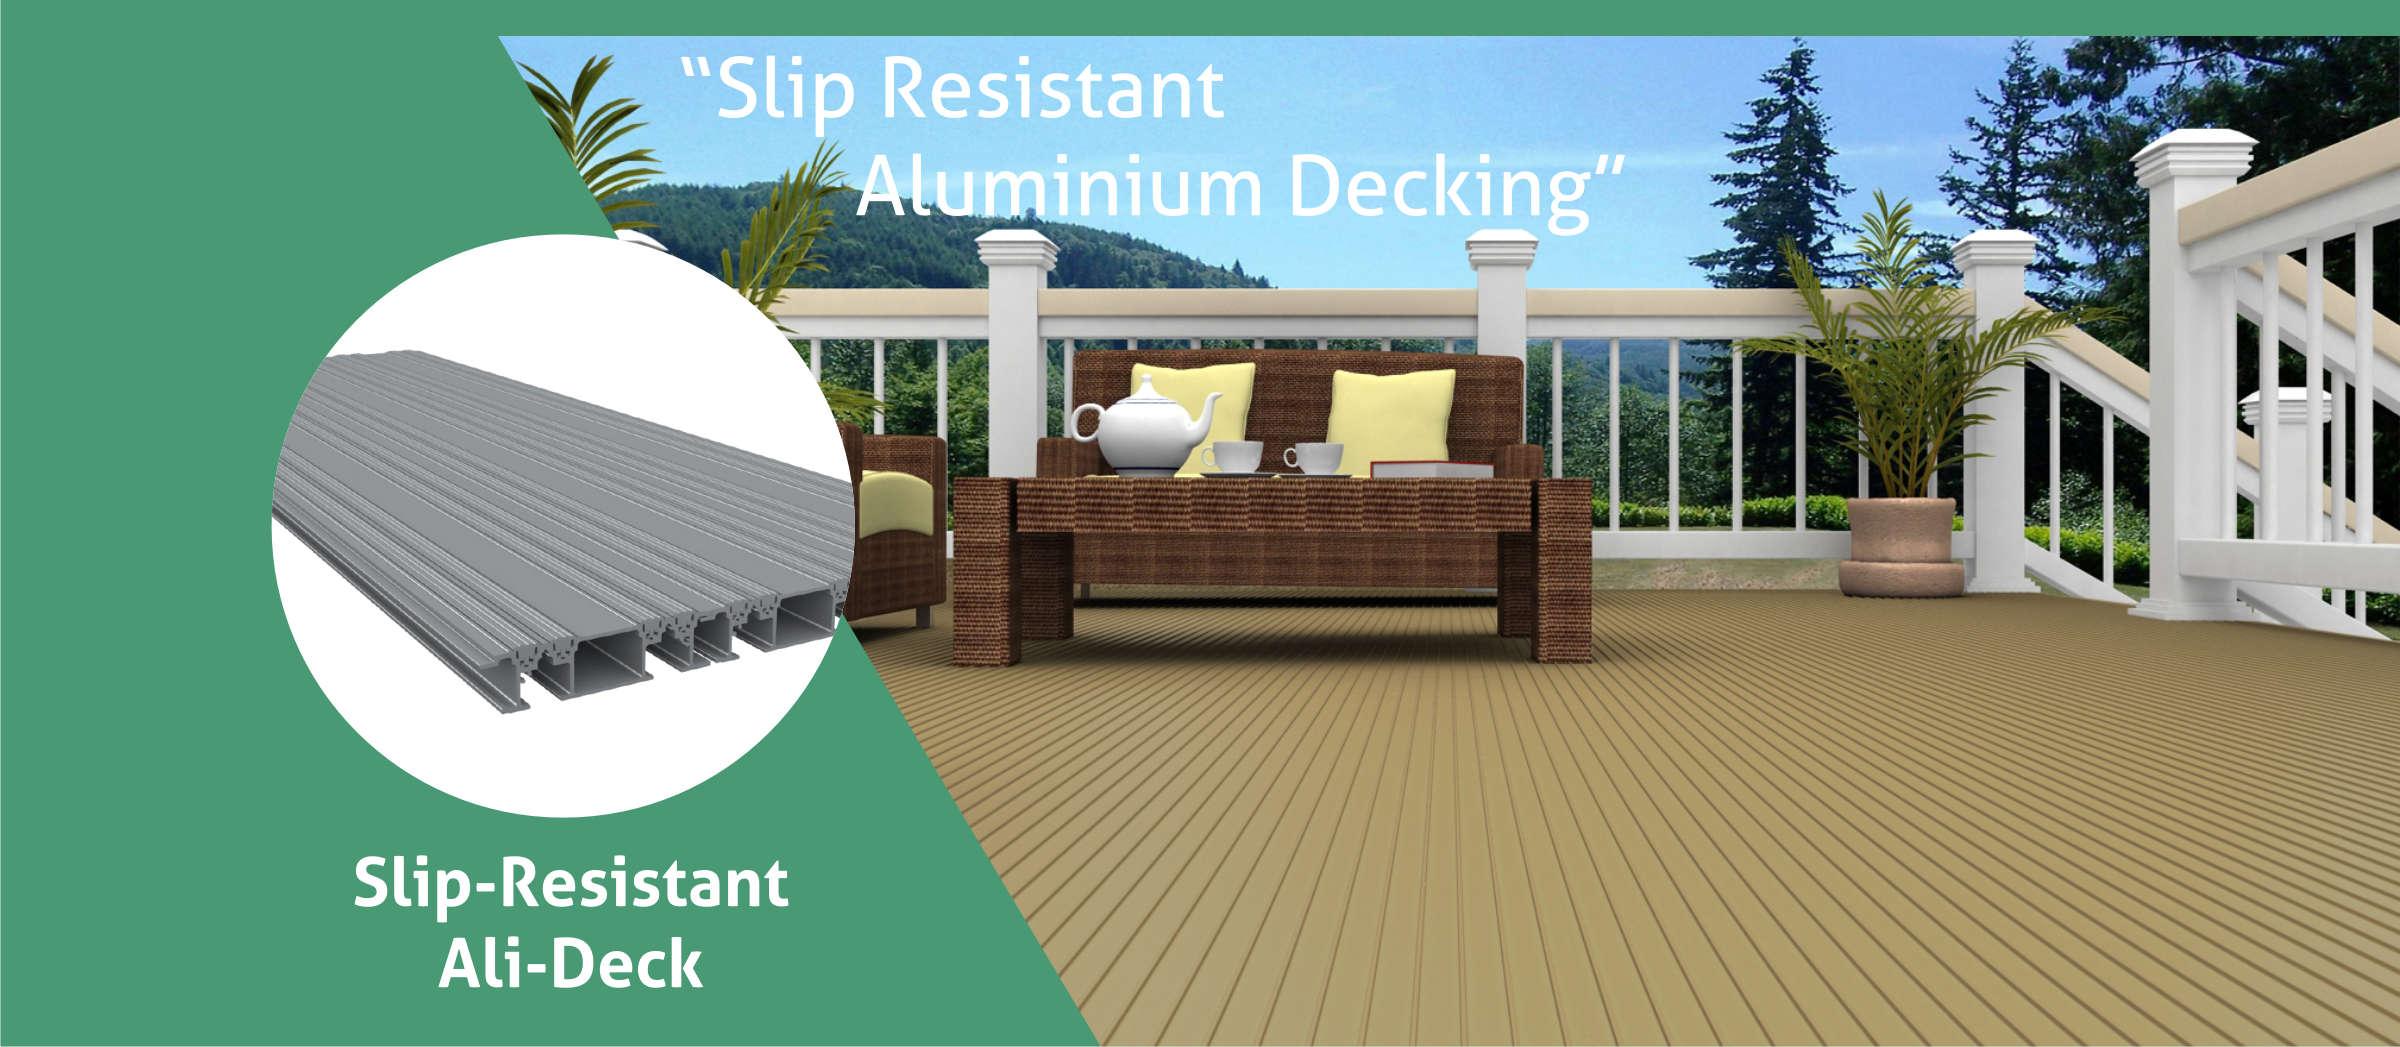 Slip Resistant Ali-Deck